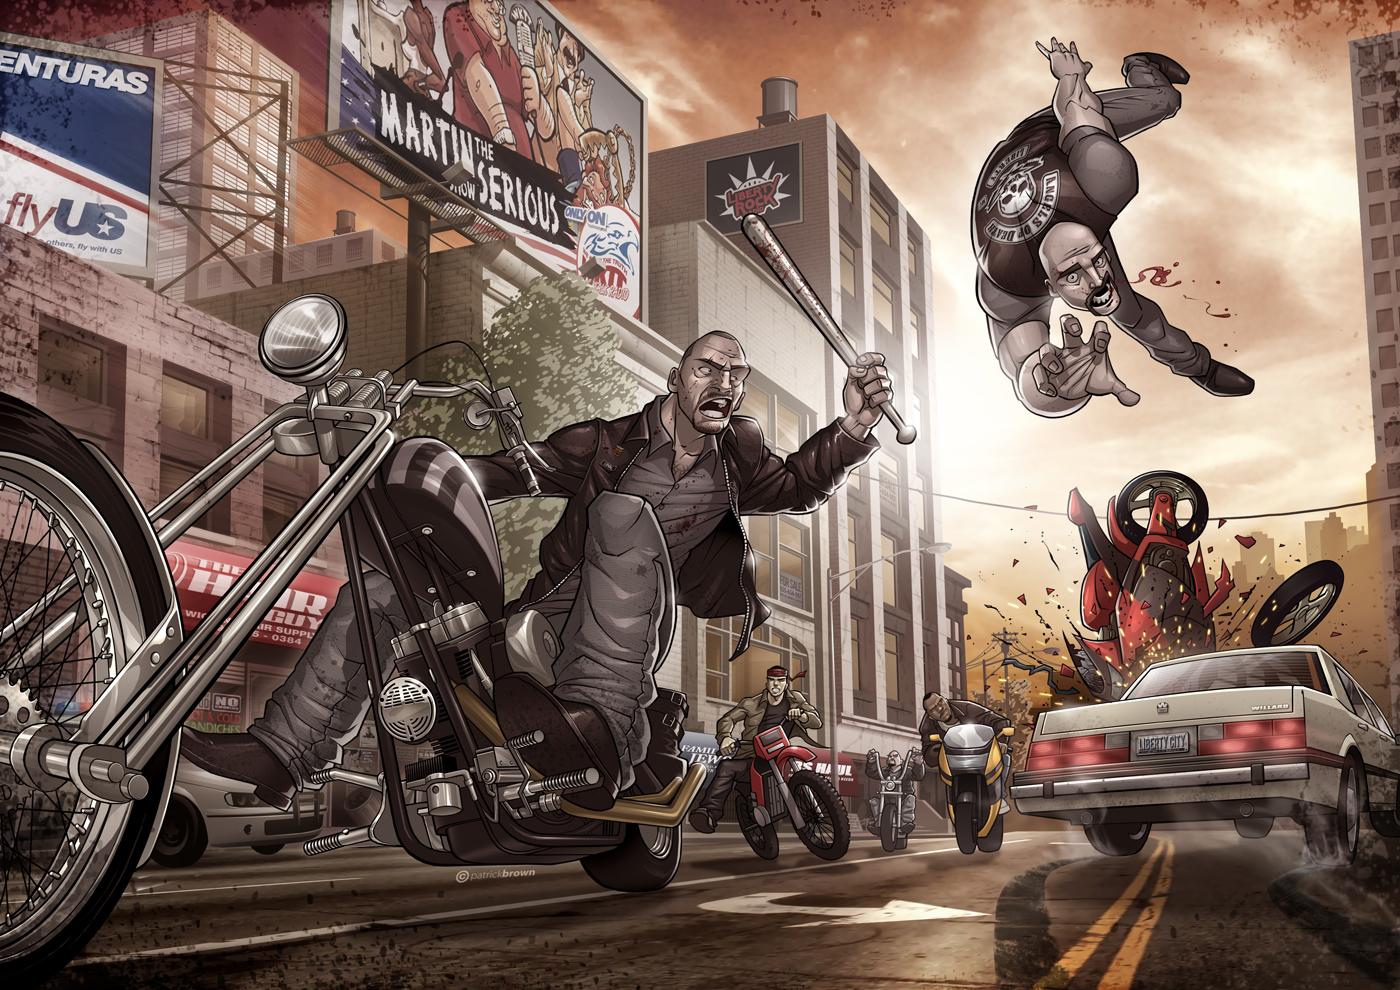 582fbf7cce3610c73407e34d1d236463.jpg - Grand Theft Auto 4